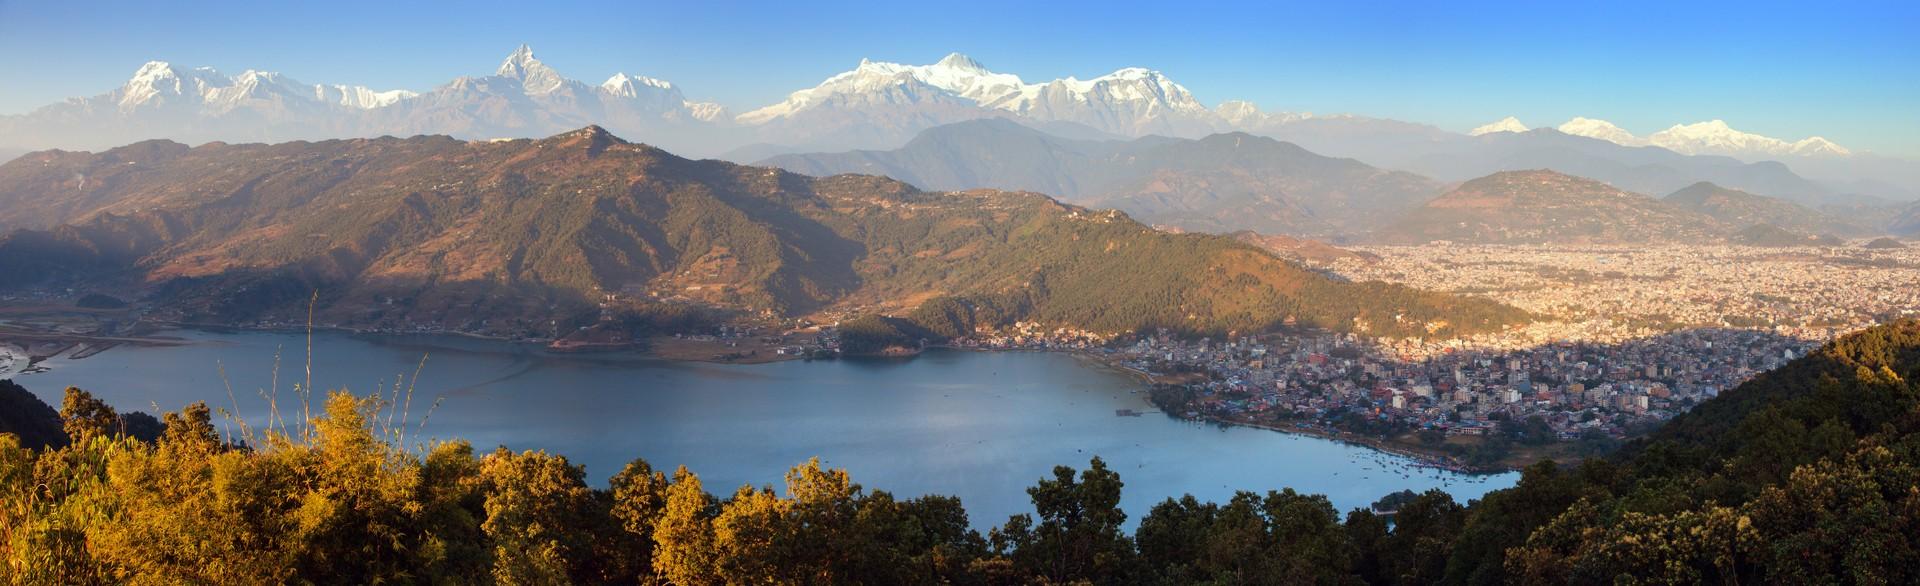 Views over Pohkara Valley landscape